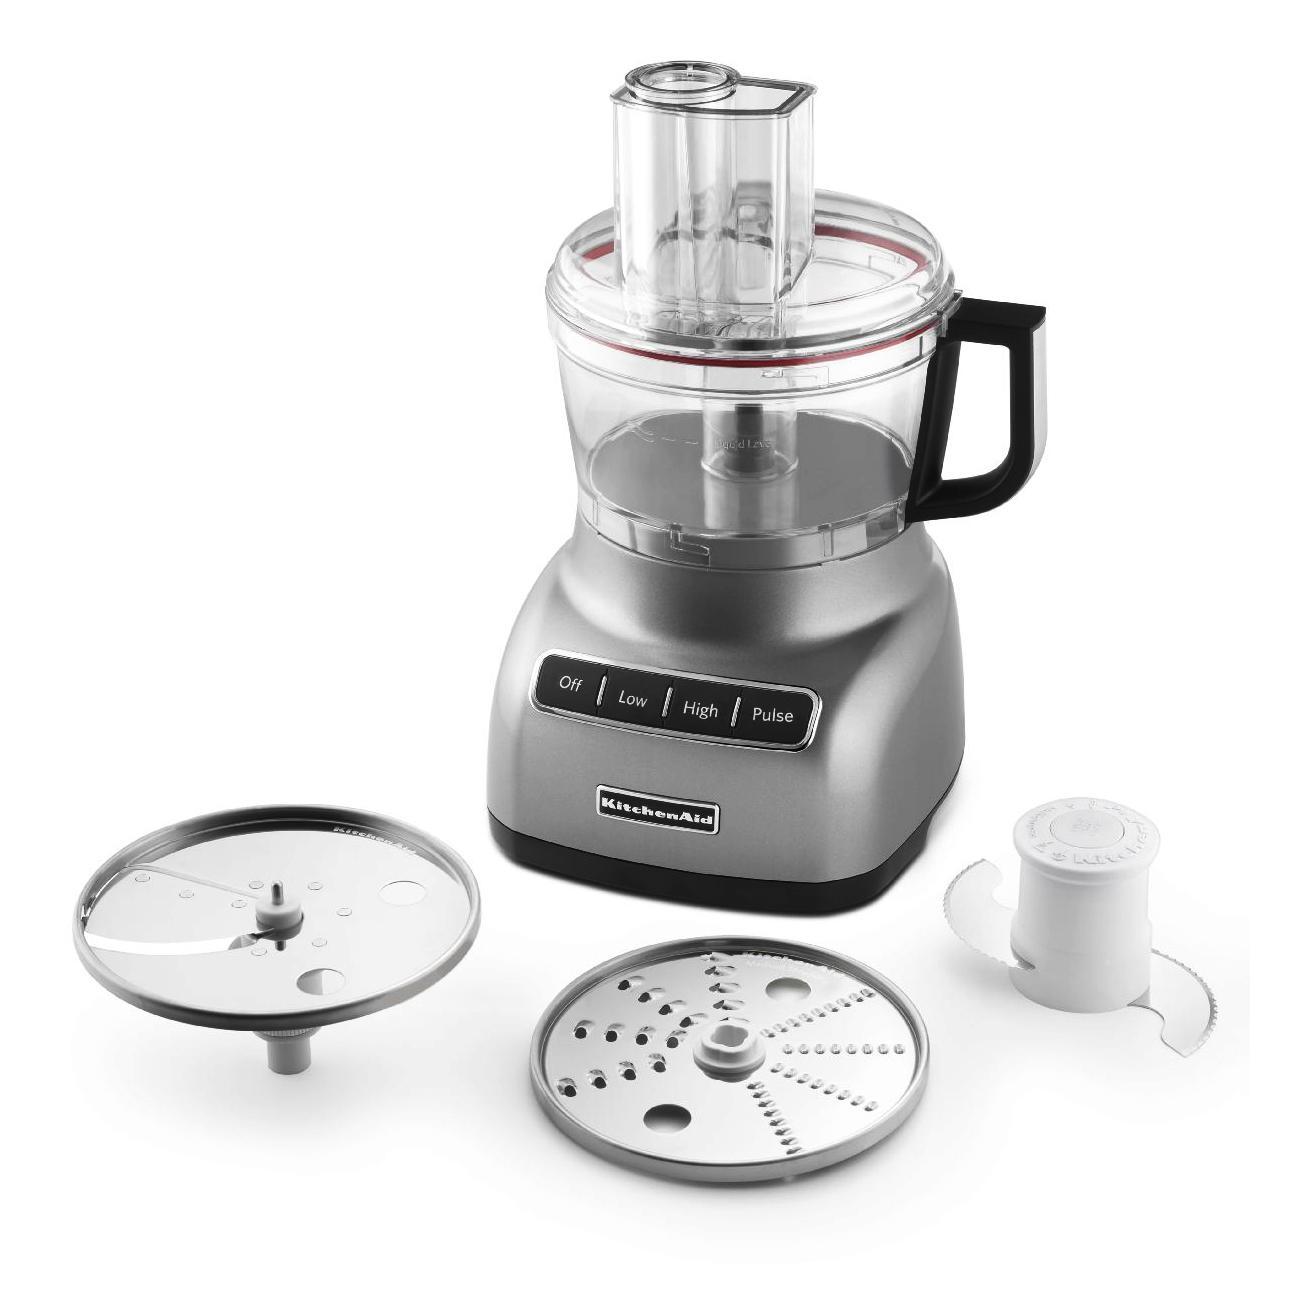 KitchenAid Contour Silver 7-Cup Food Processor